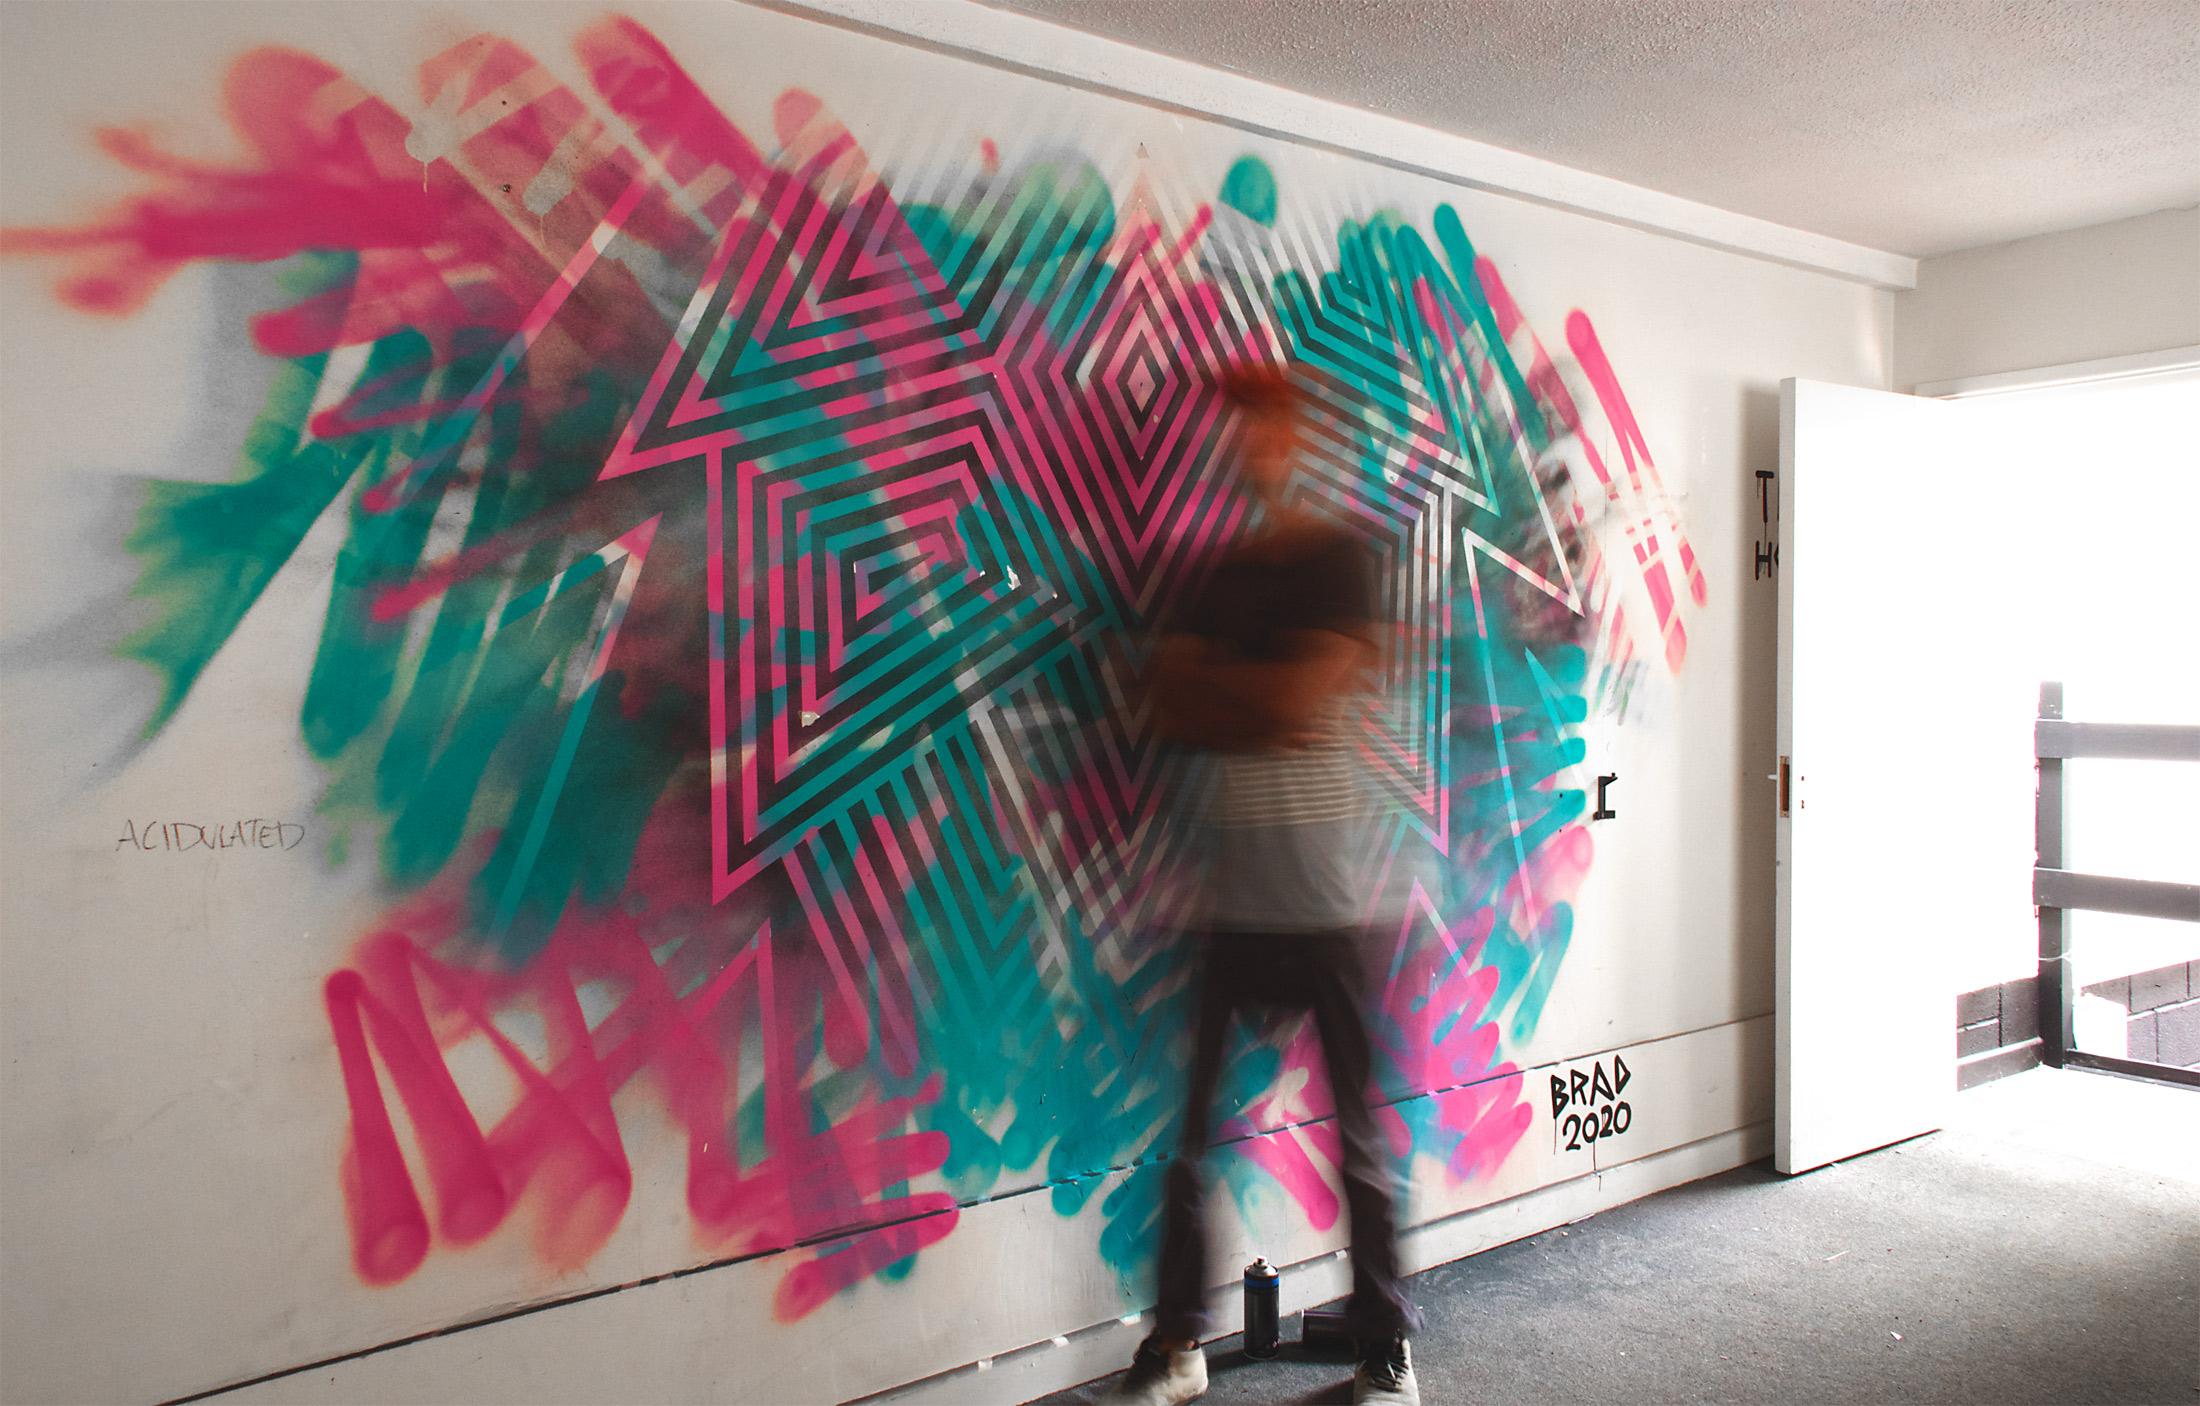 abstract-street-art-mural-devon-craft-beer-stannary